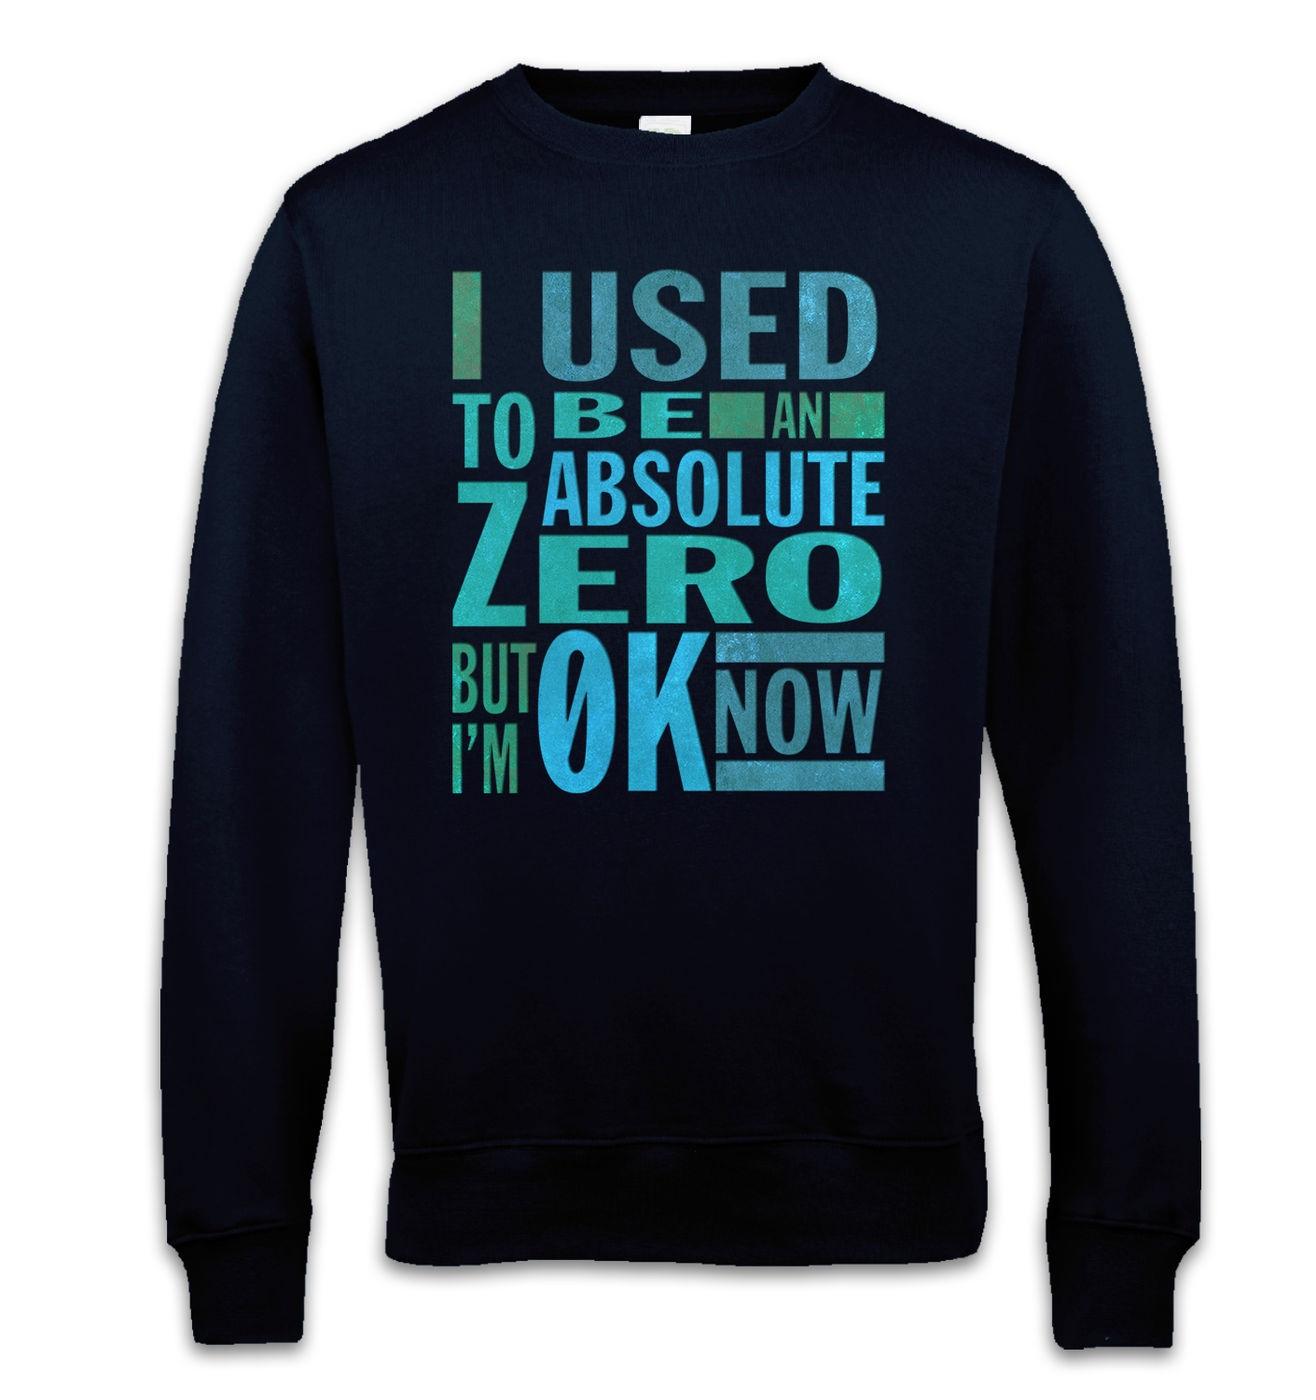 Absolute Zero 0K Now sweatshirt - funny science slogan sweater